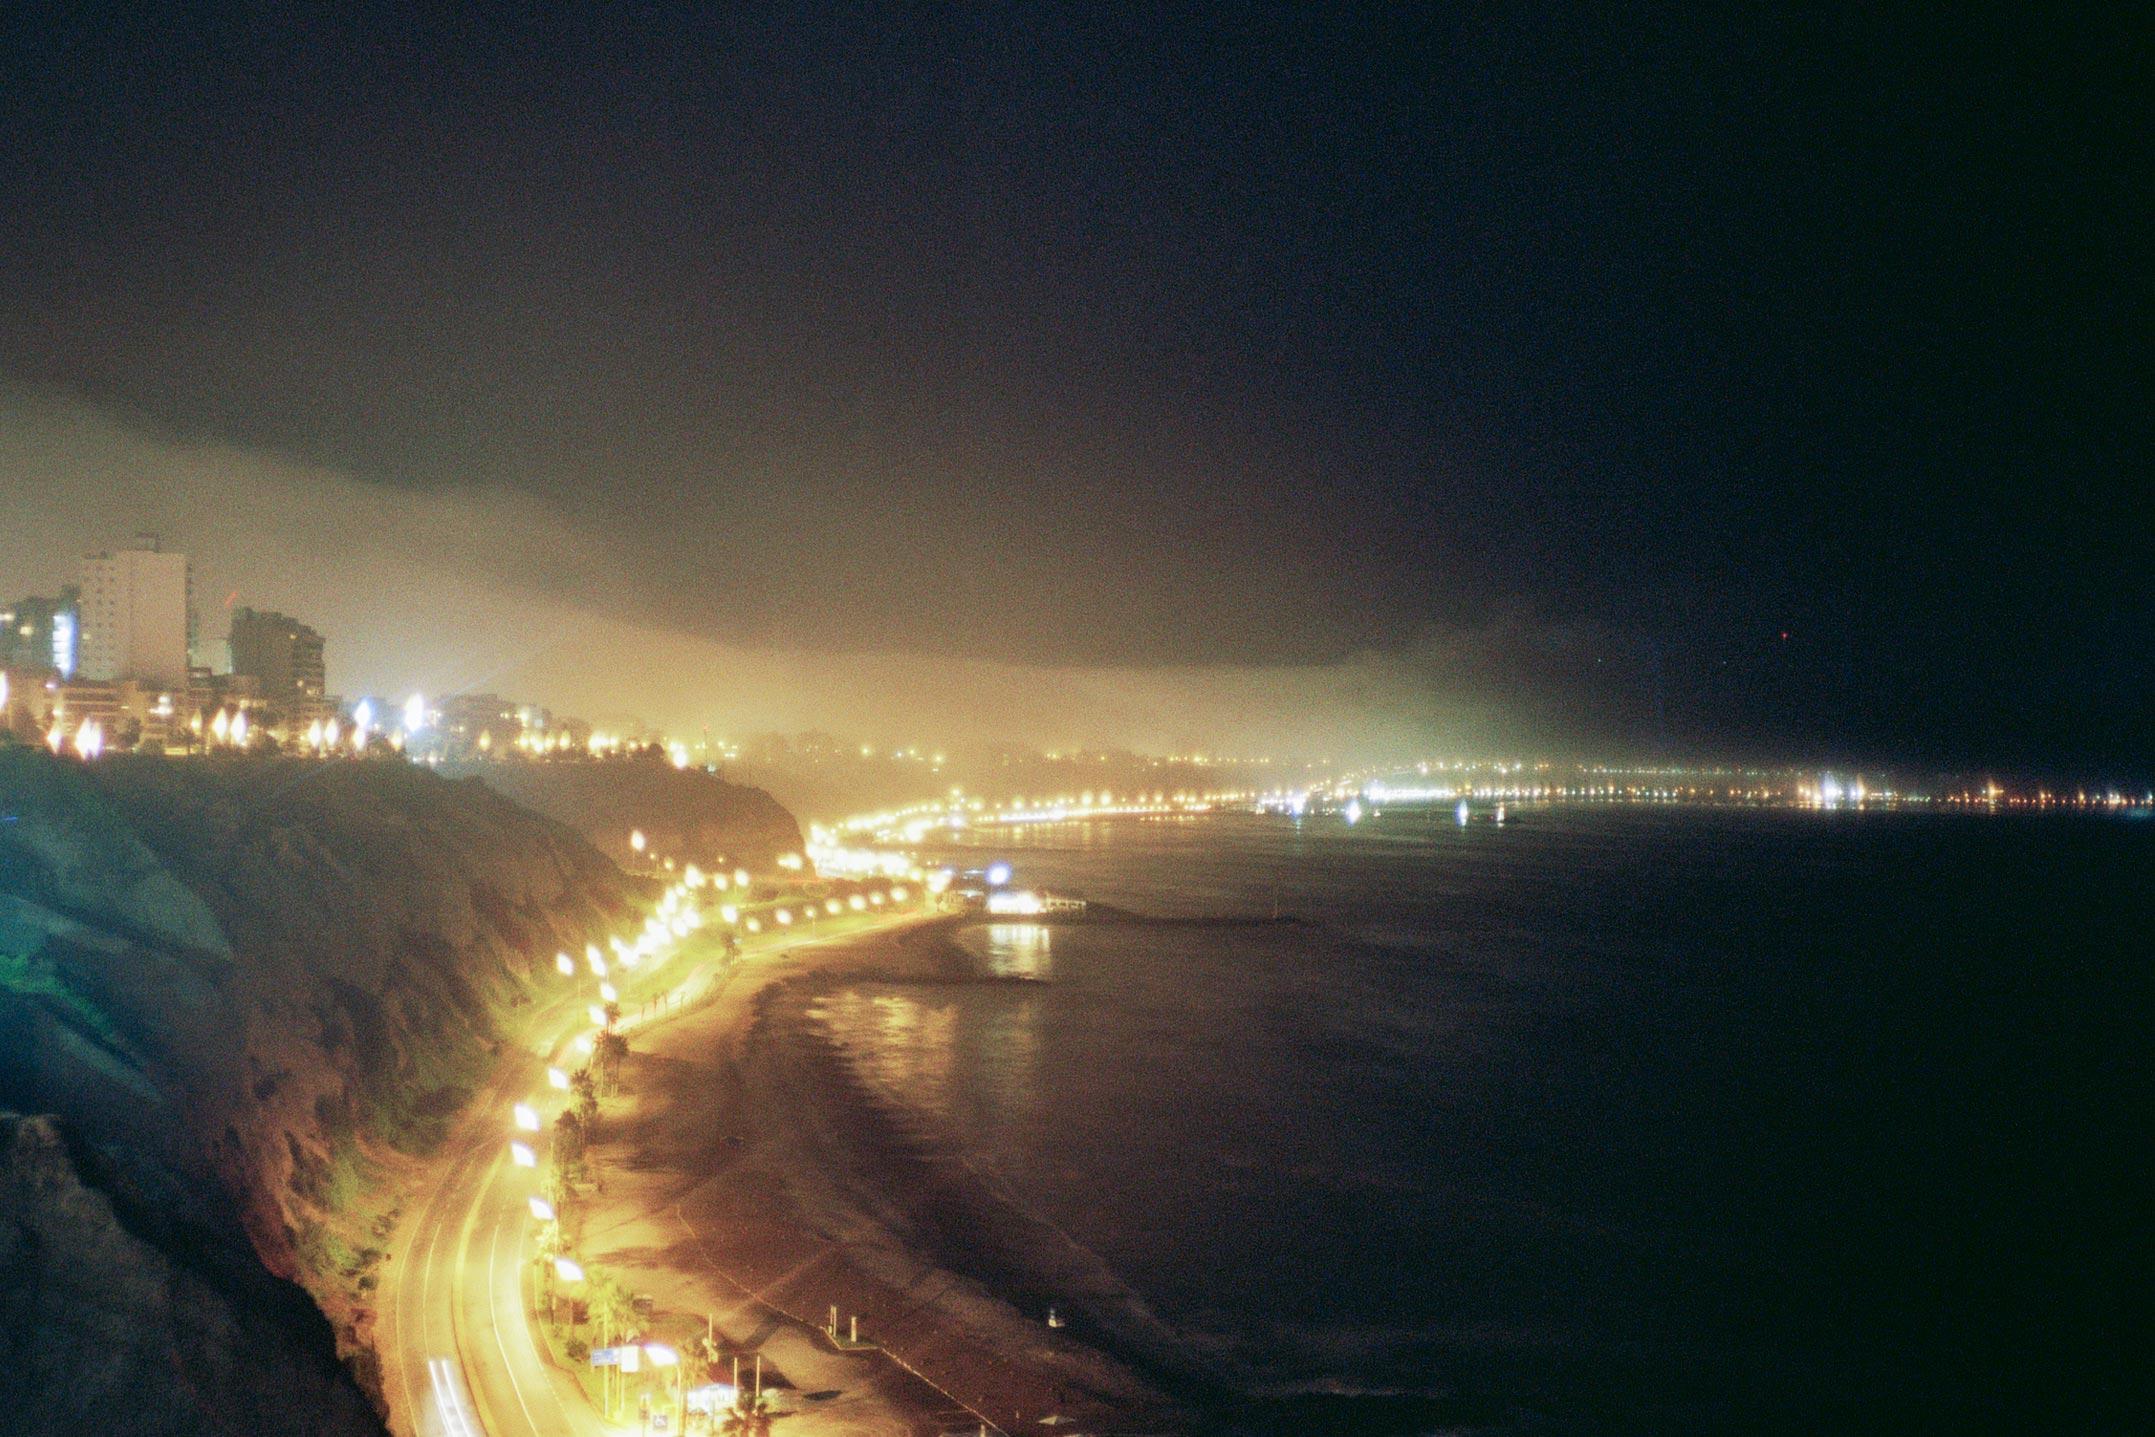 Peru Lima Miraflores Larcomar night ocean